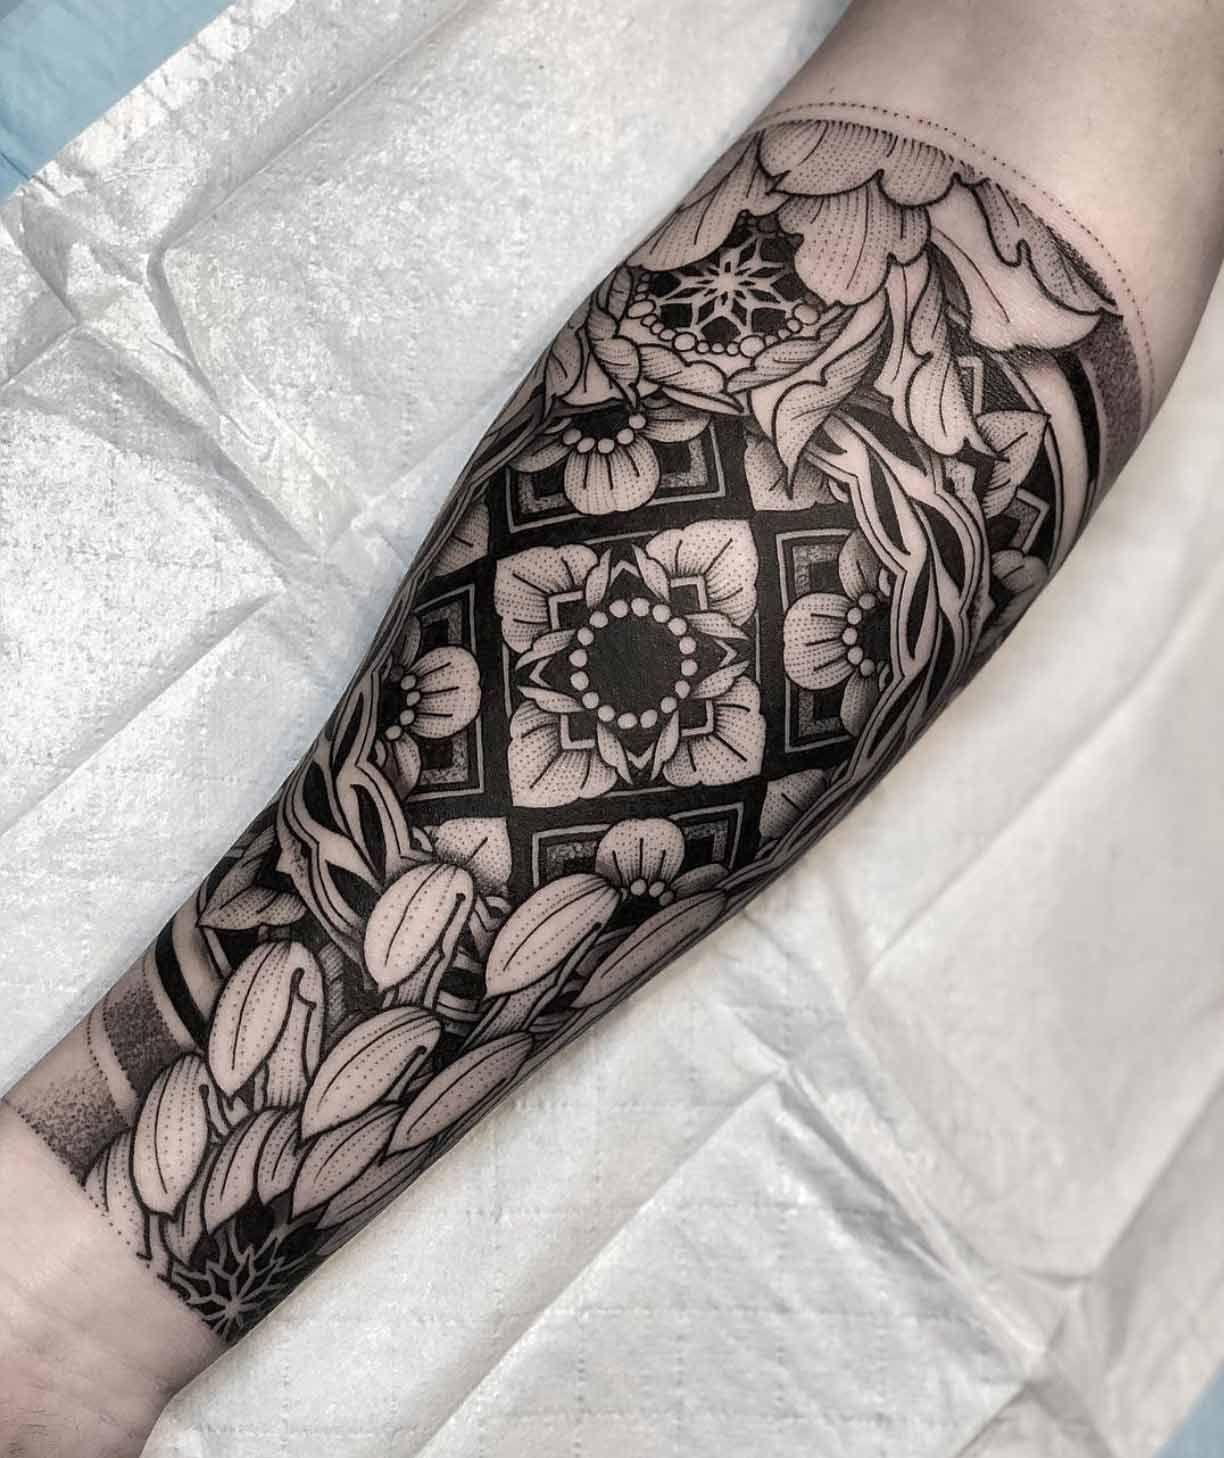 A Captivating Half Sleeve By Jayce Wallingford Half Sleeve Tattoo Half Sleeve Tattoos Designs Half Sleeve Tattoos Color